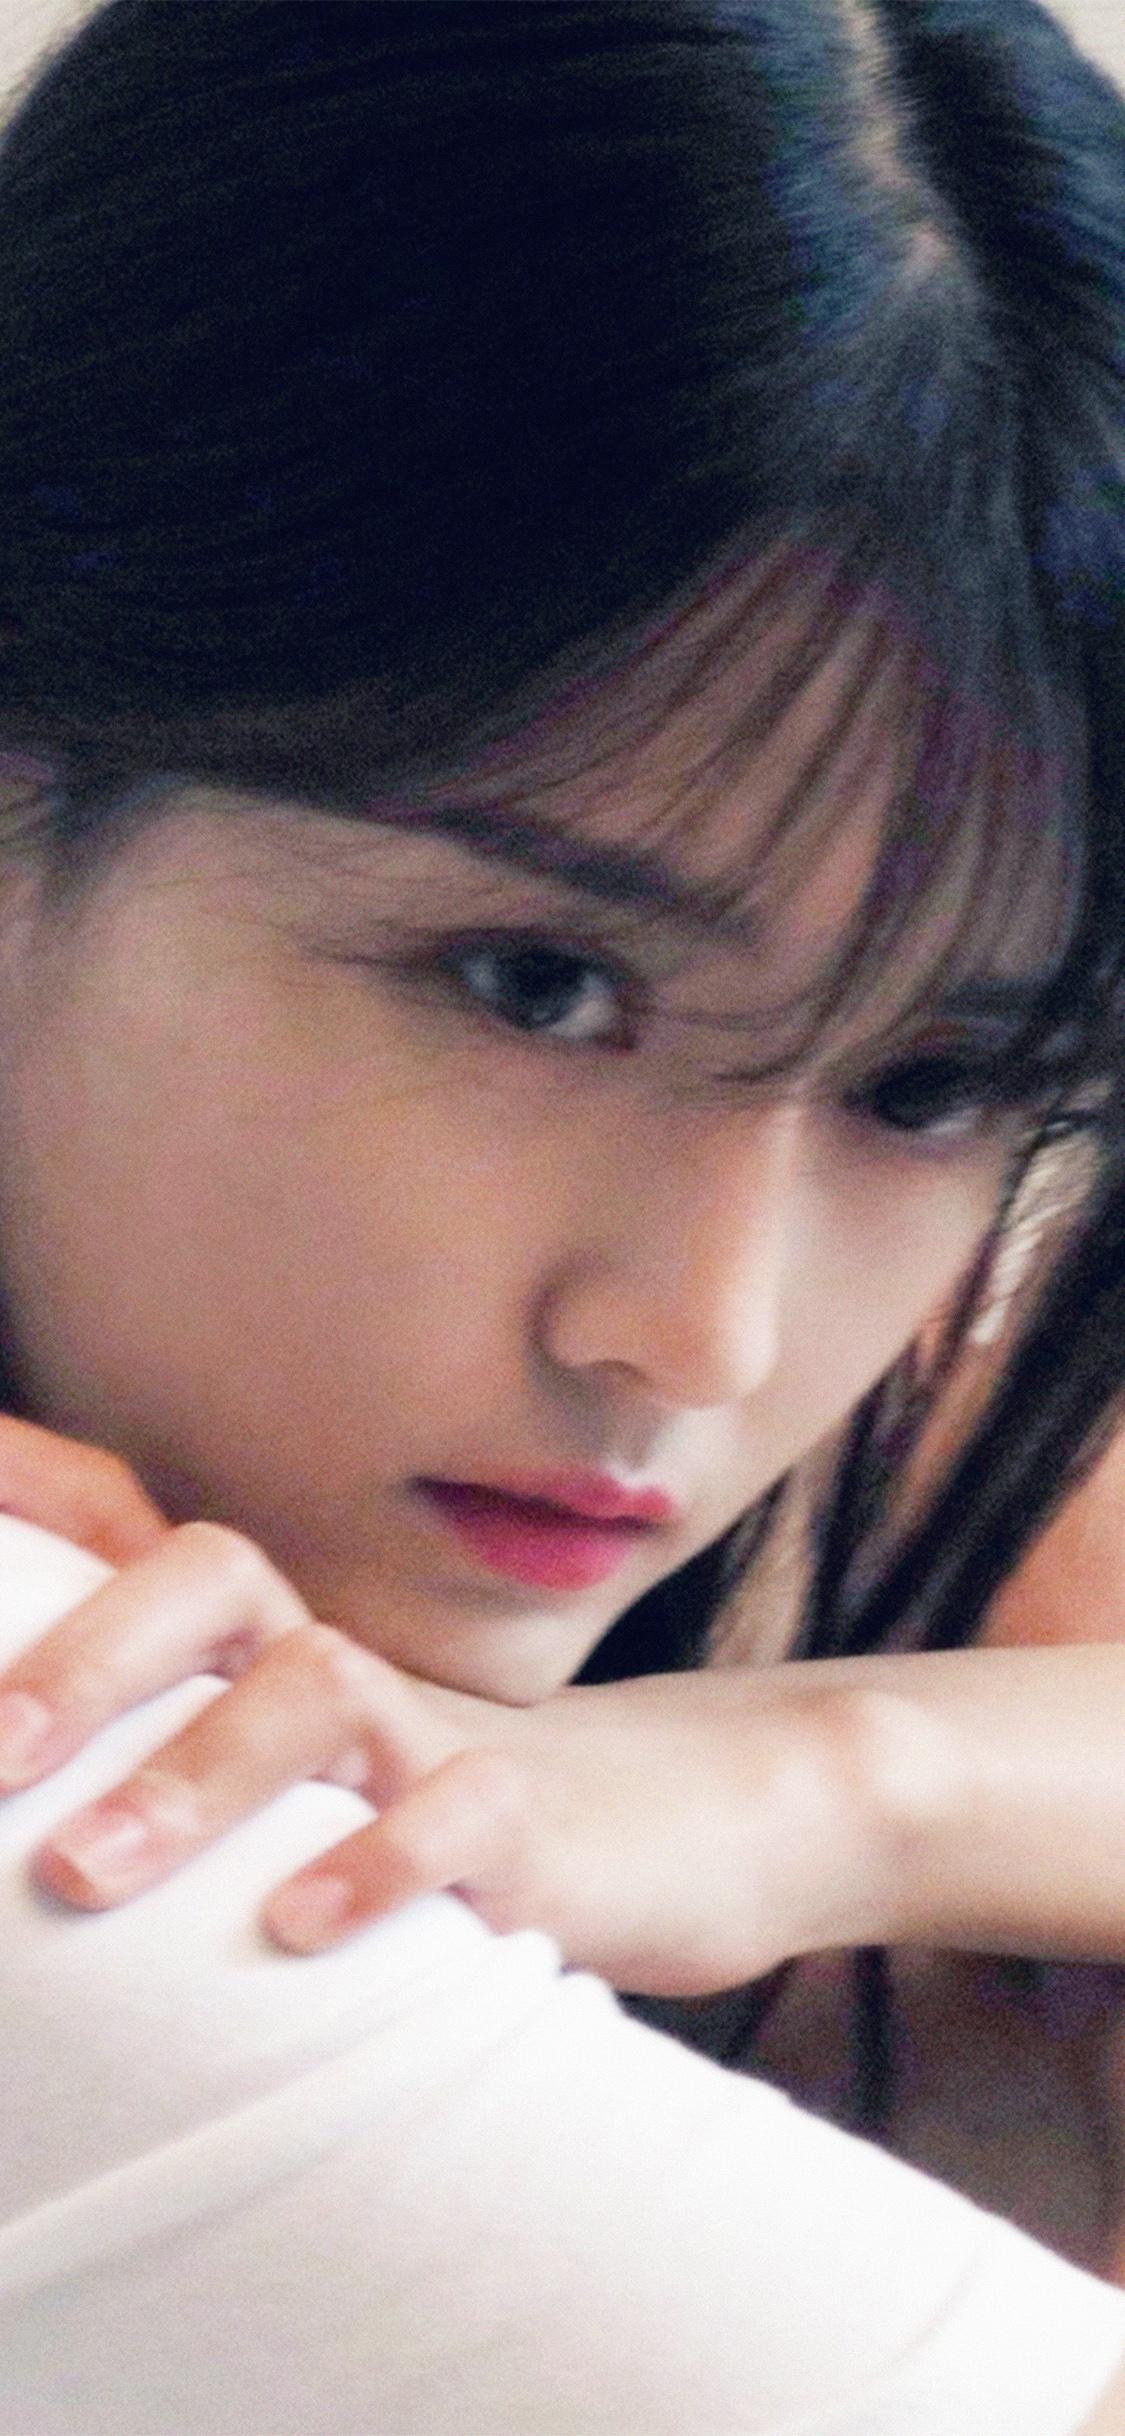 iPhoneXpapers.com-Apple-iPhone-wallpaper-hl28-bora-kpop-girl-cute-celebrity